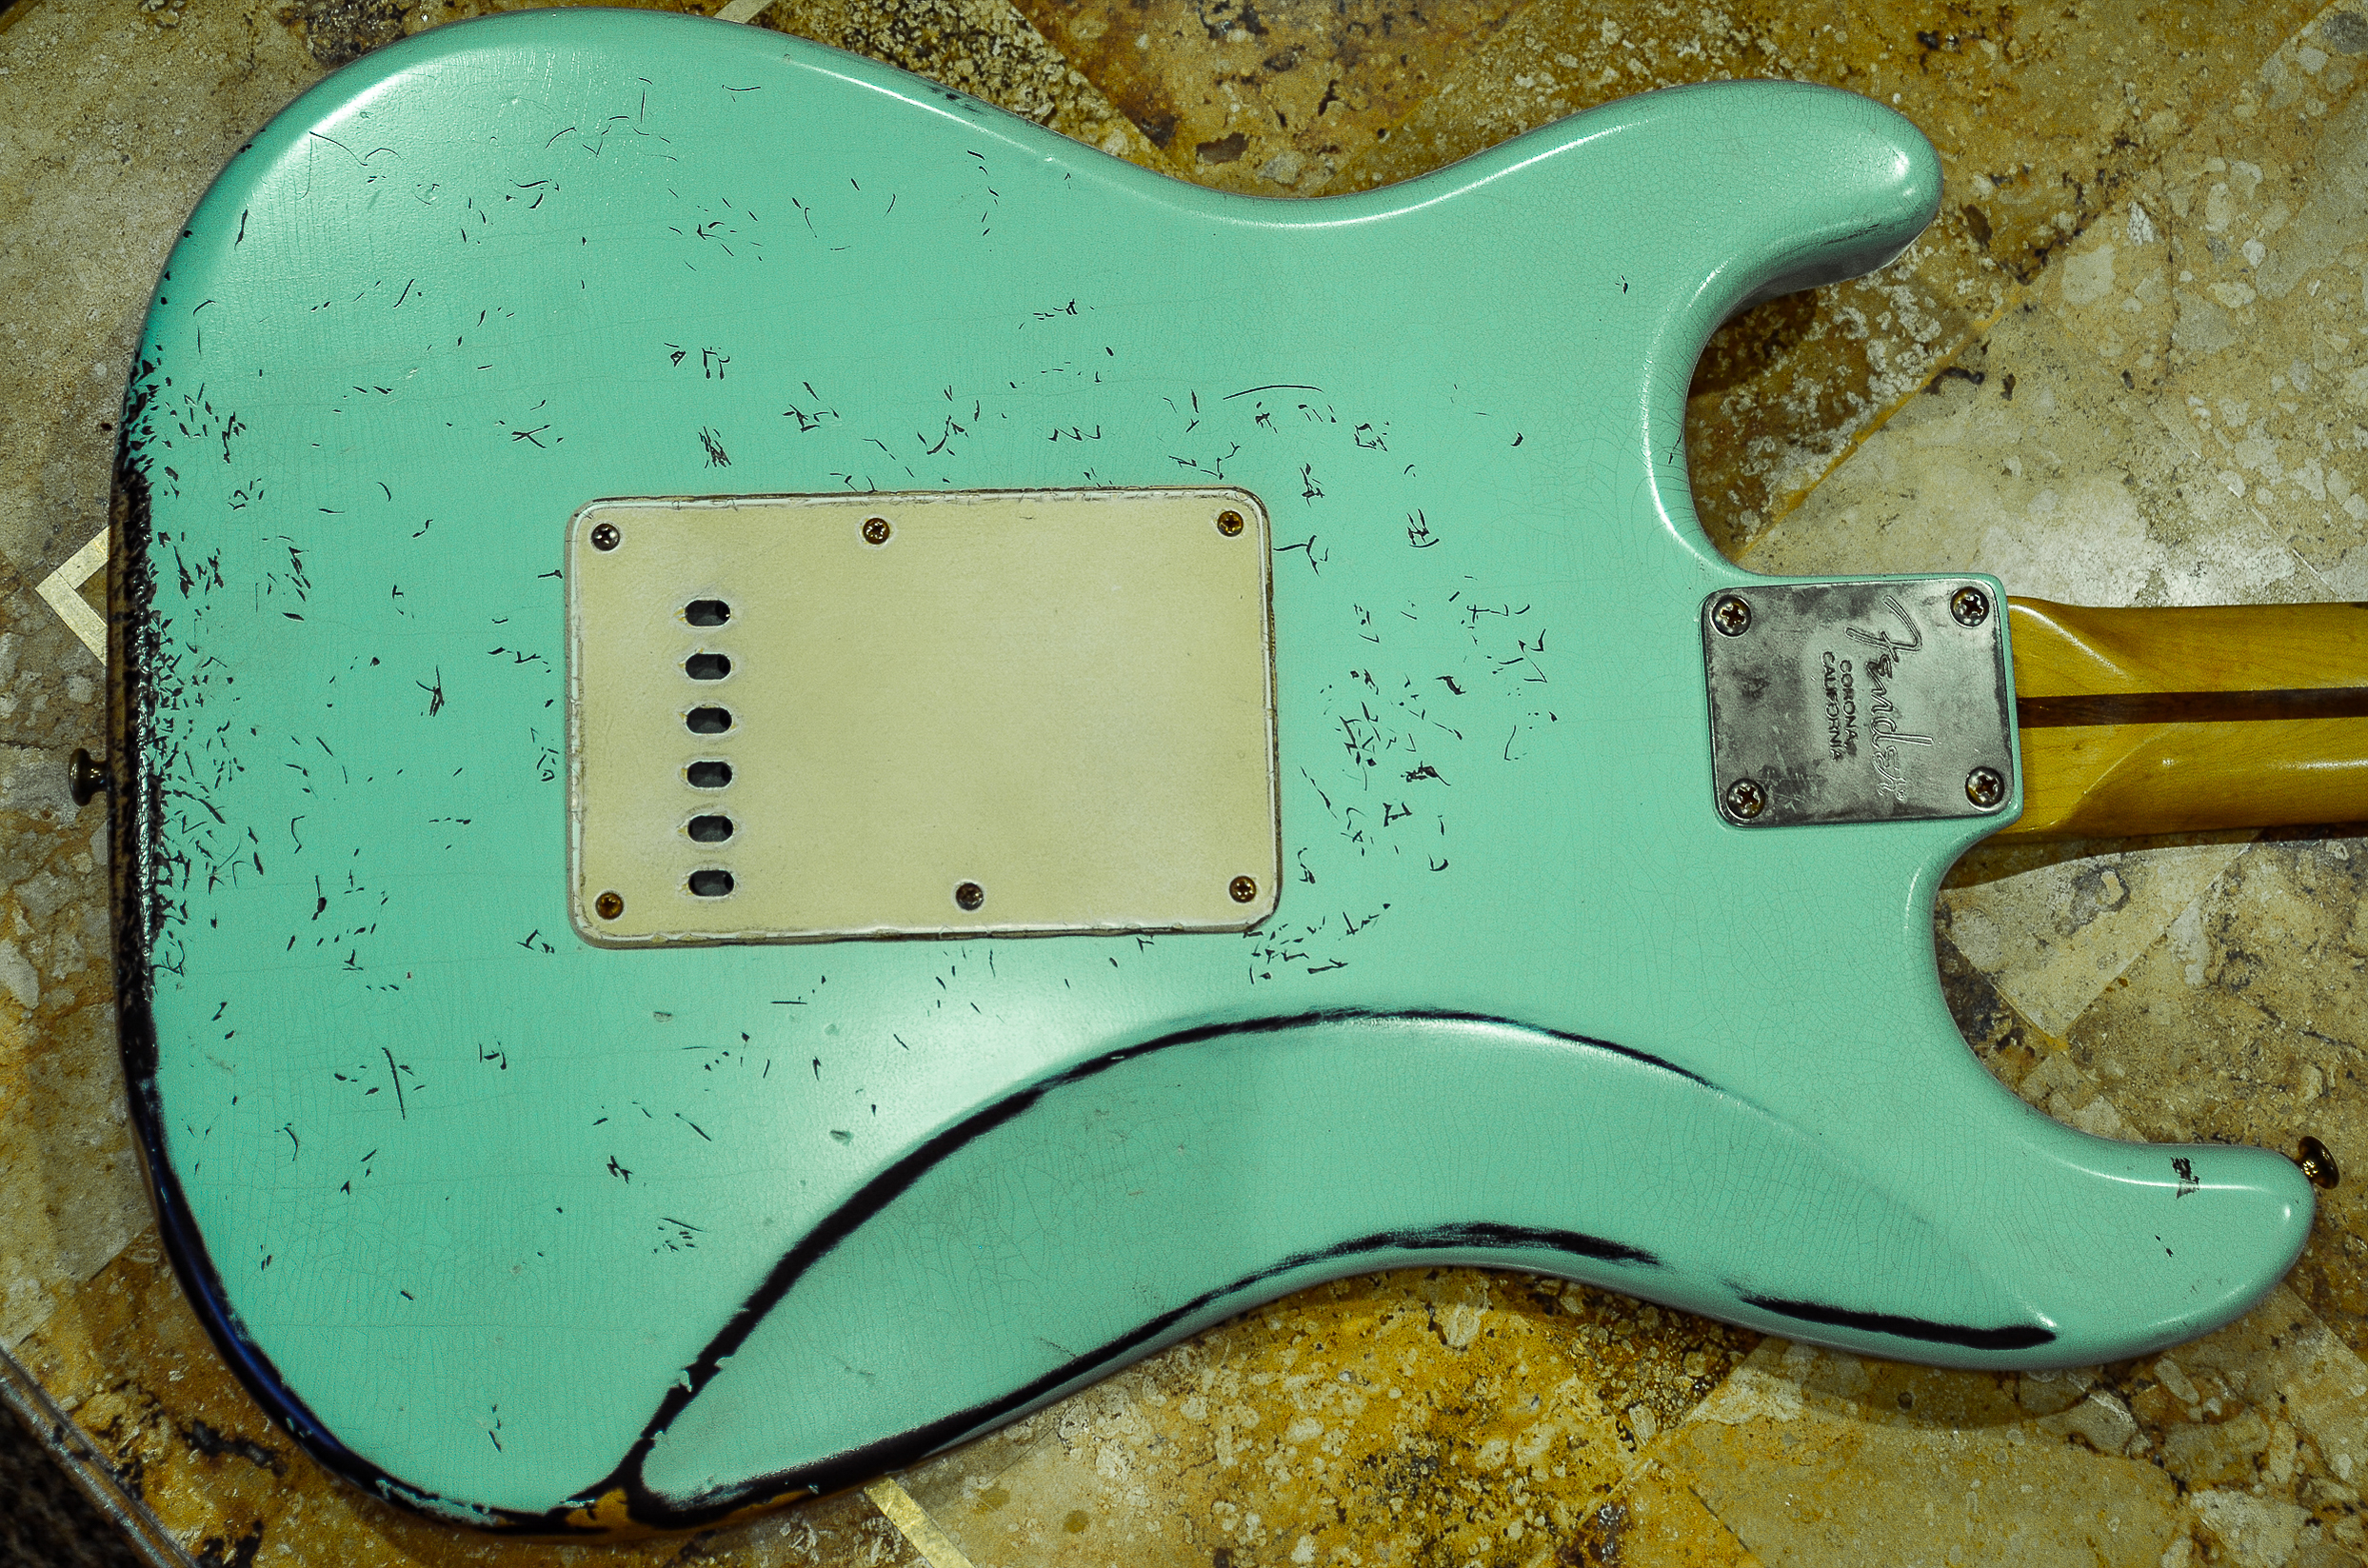 Fender Stratocaster Aged Surf Green Back Plate Cover Guitarwacky.com